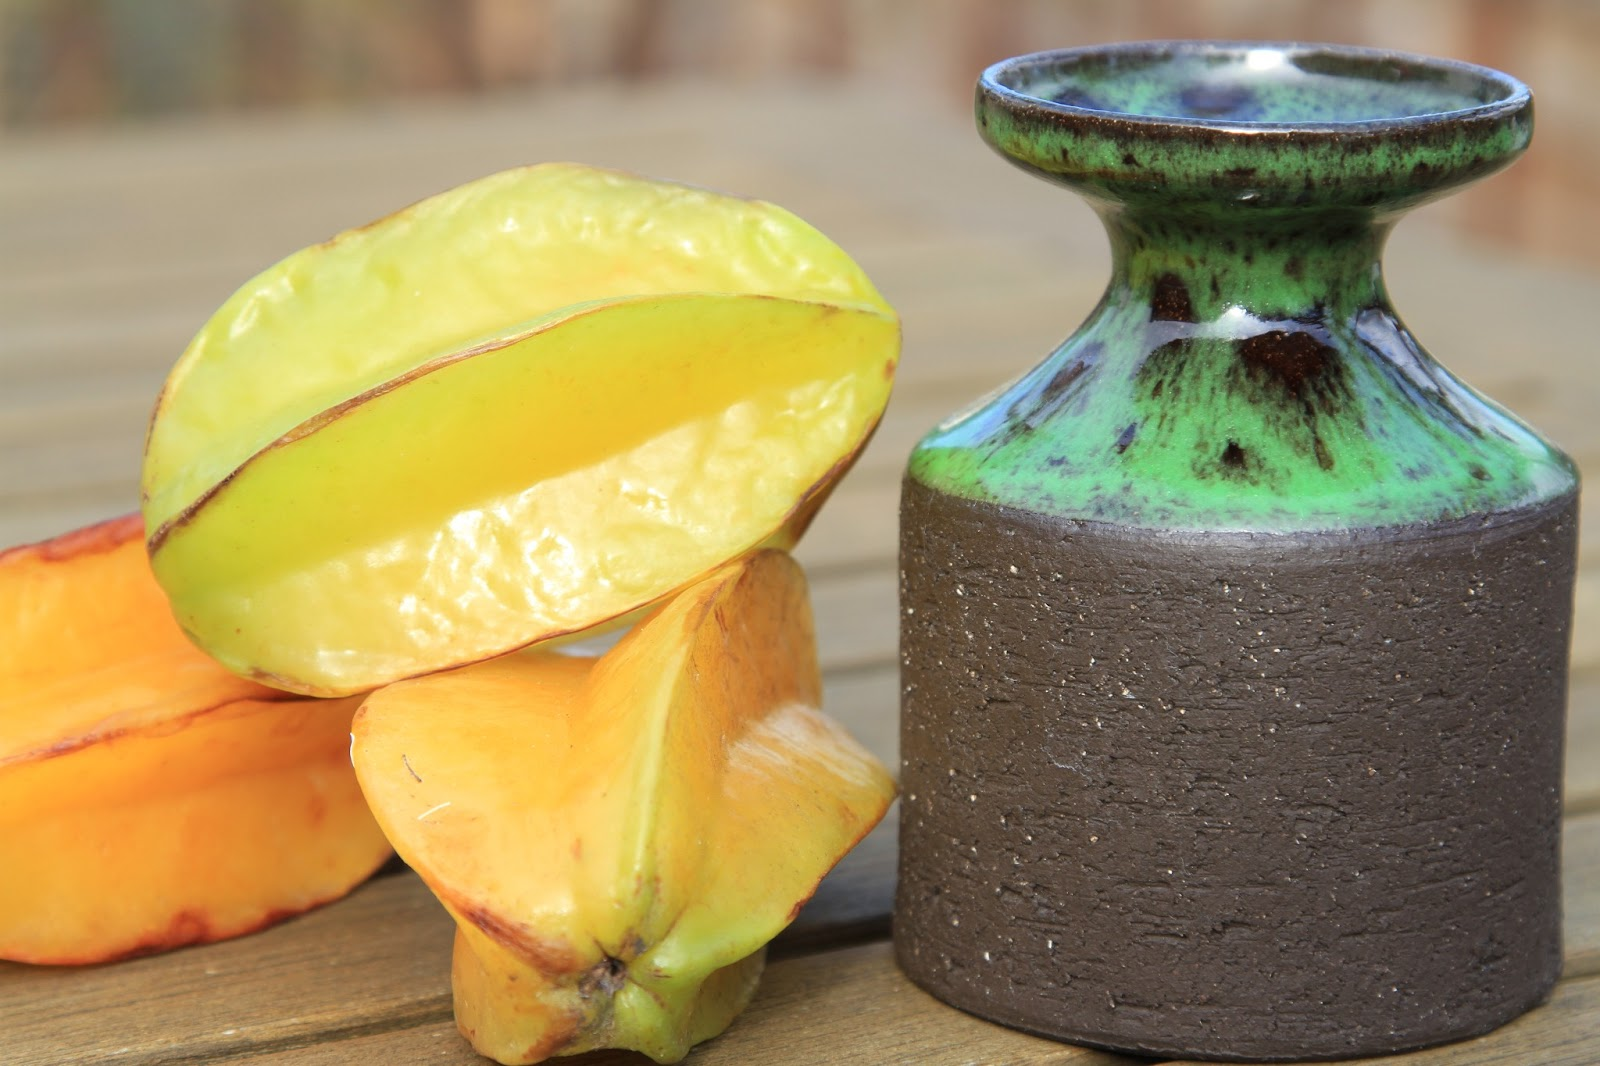 lehmann keramik TravelMarx: Lehmann Keramik Vase and Starfruit (Carambola) lehmann keramik